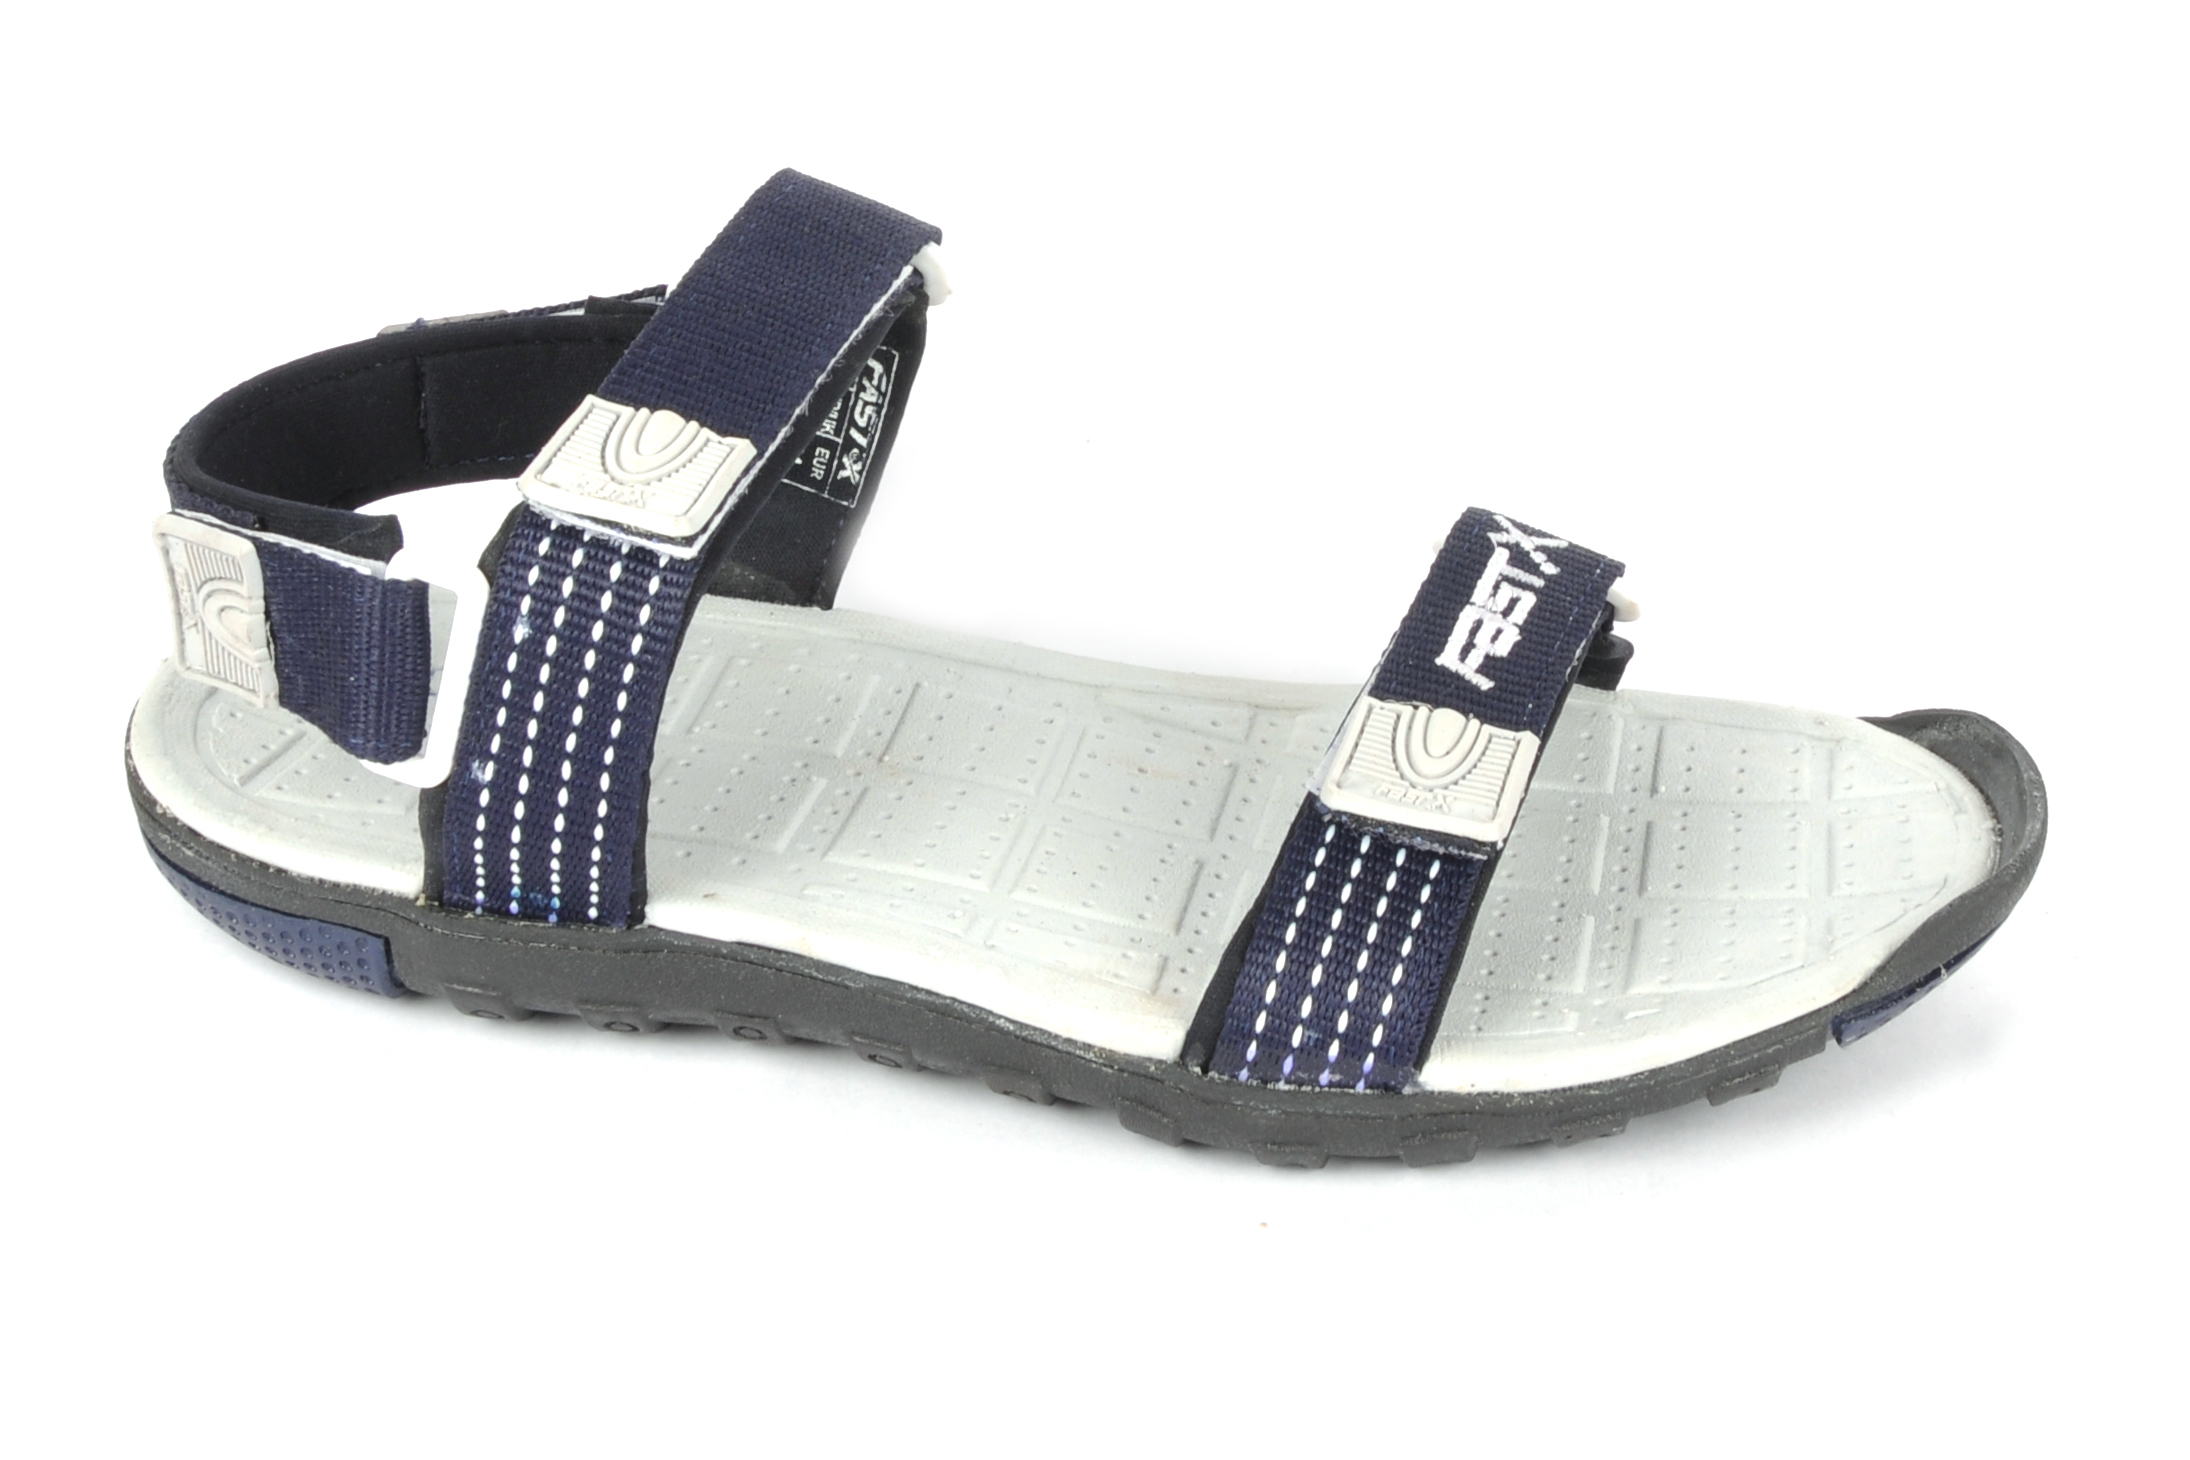 Outdoor mens sandal